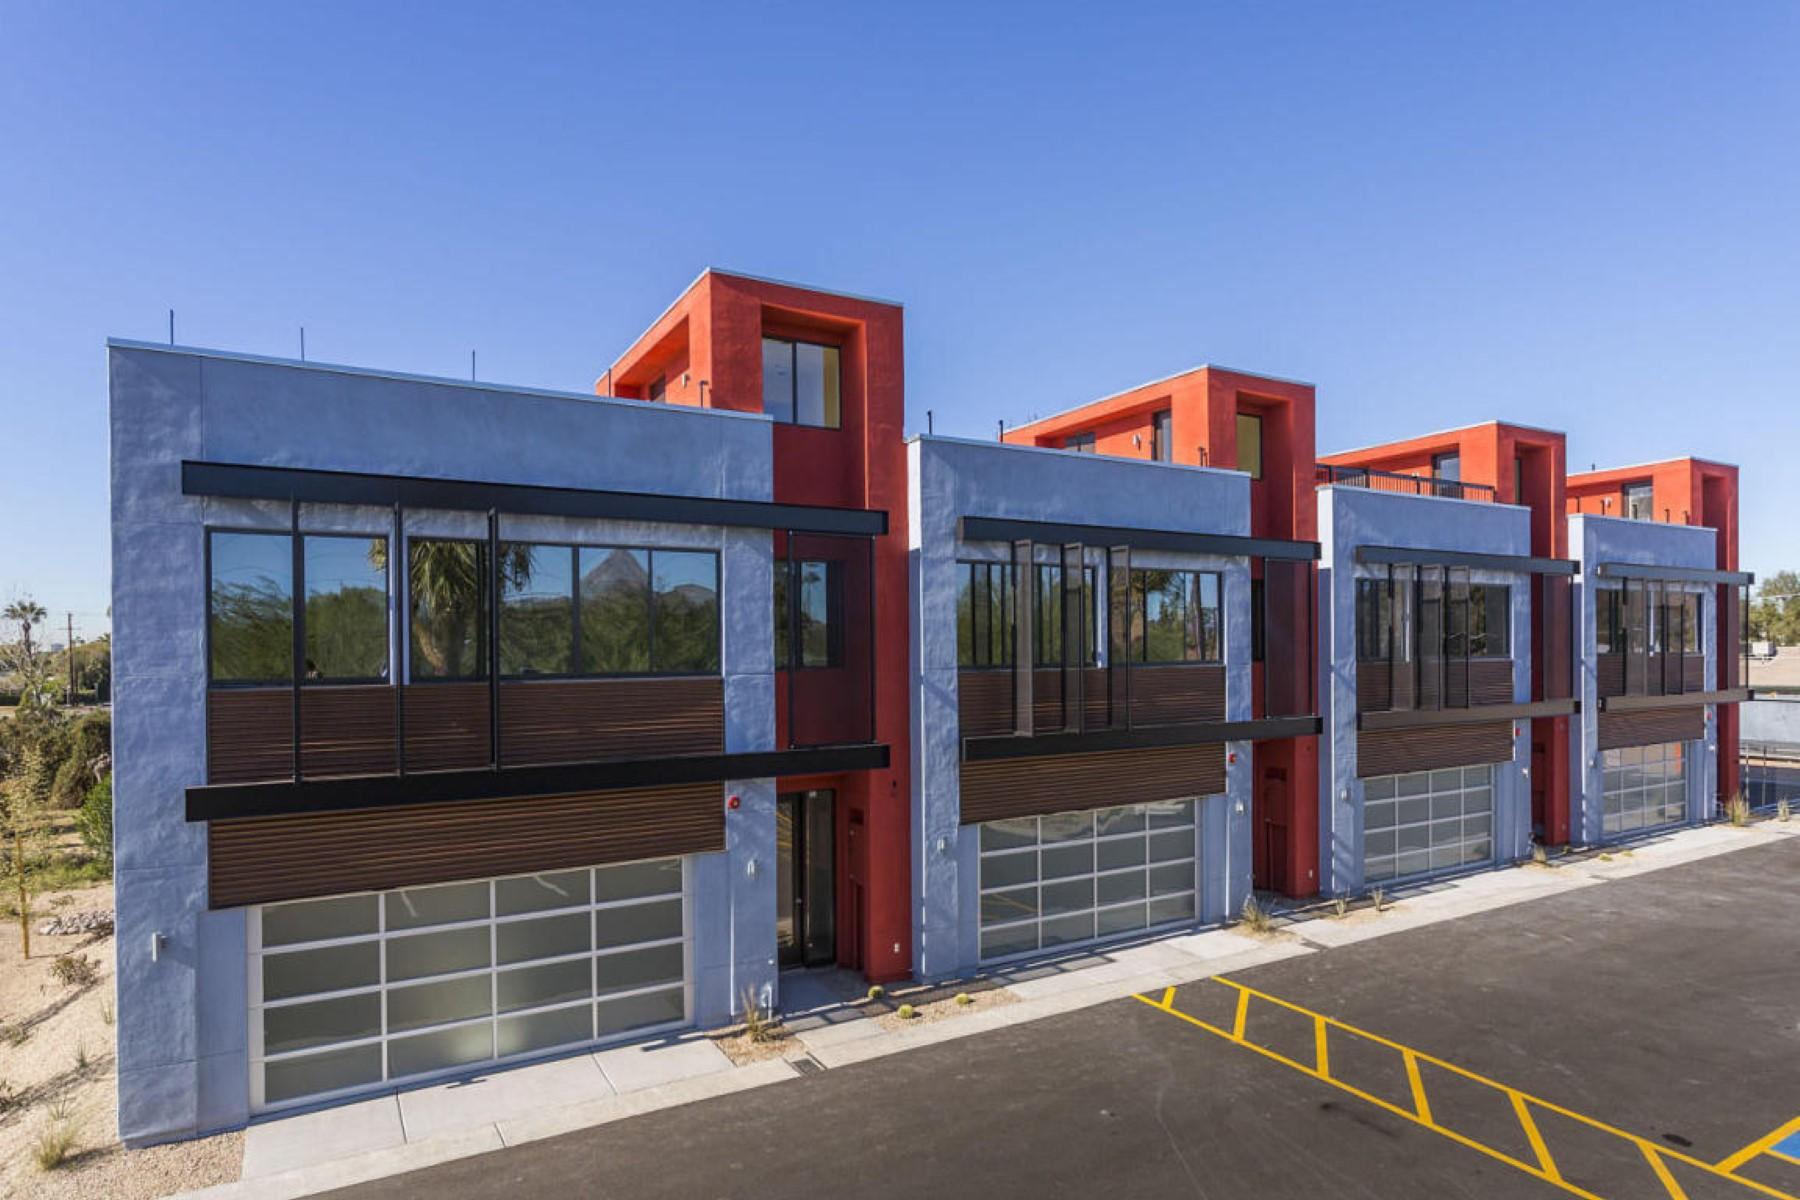 Einfamilienhaus für Verkauf beim Two-story home near both the Arcadia and Biltmore areas 2724 E Roma Ave Phoenix, Arizona, 85016 Vereinigte Staaten